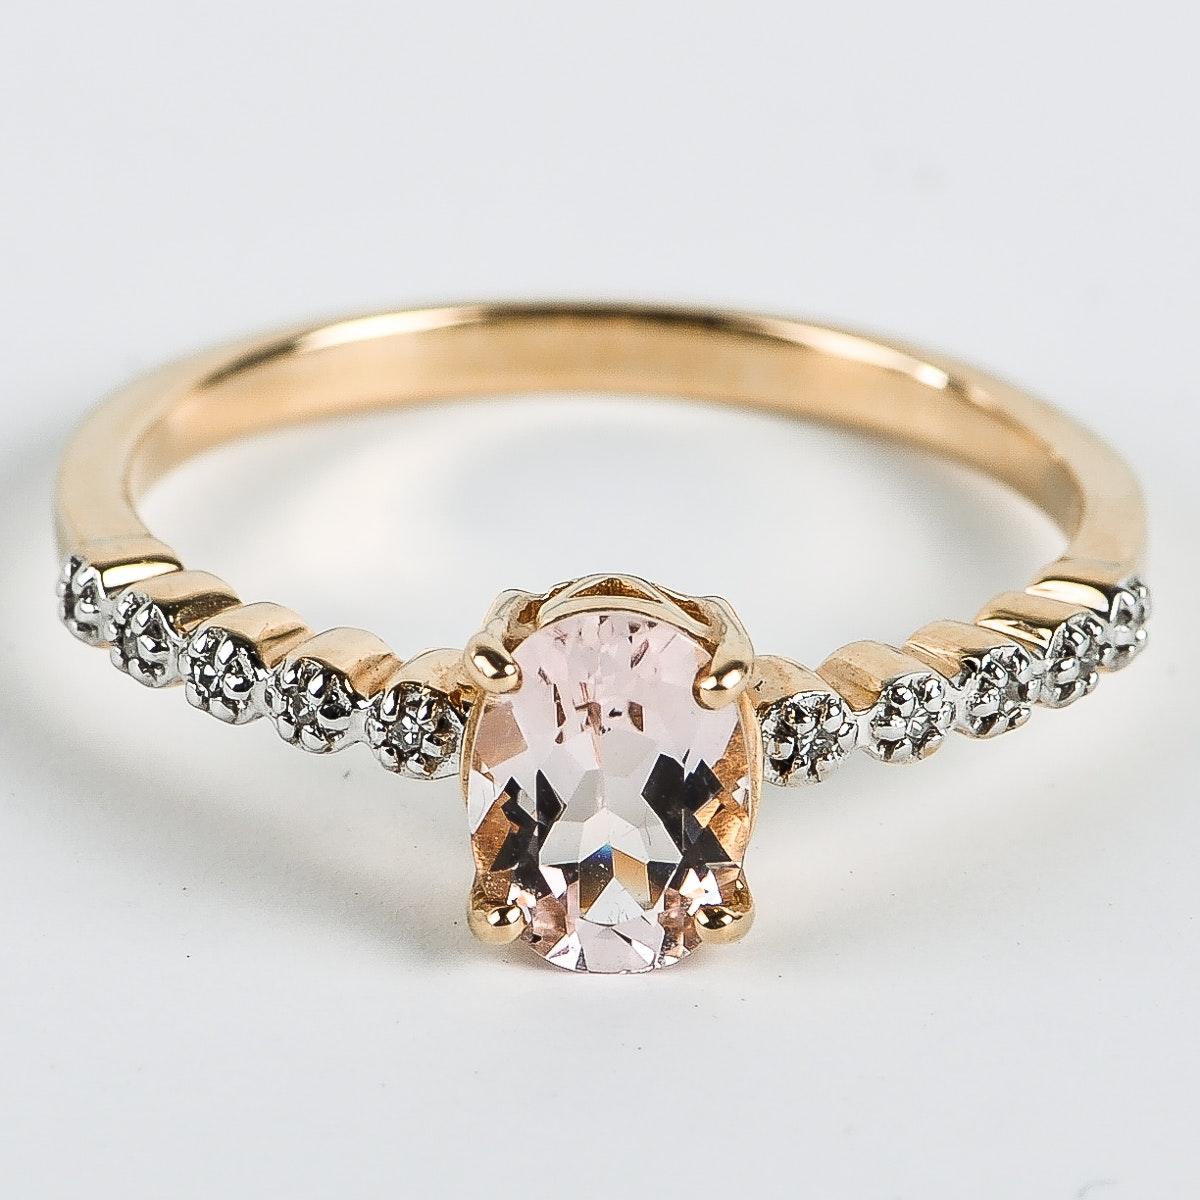 14K Yellow Gold, Morganite, and Diamond Ring